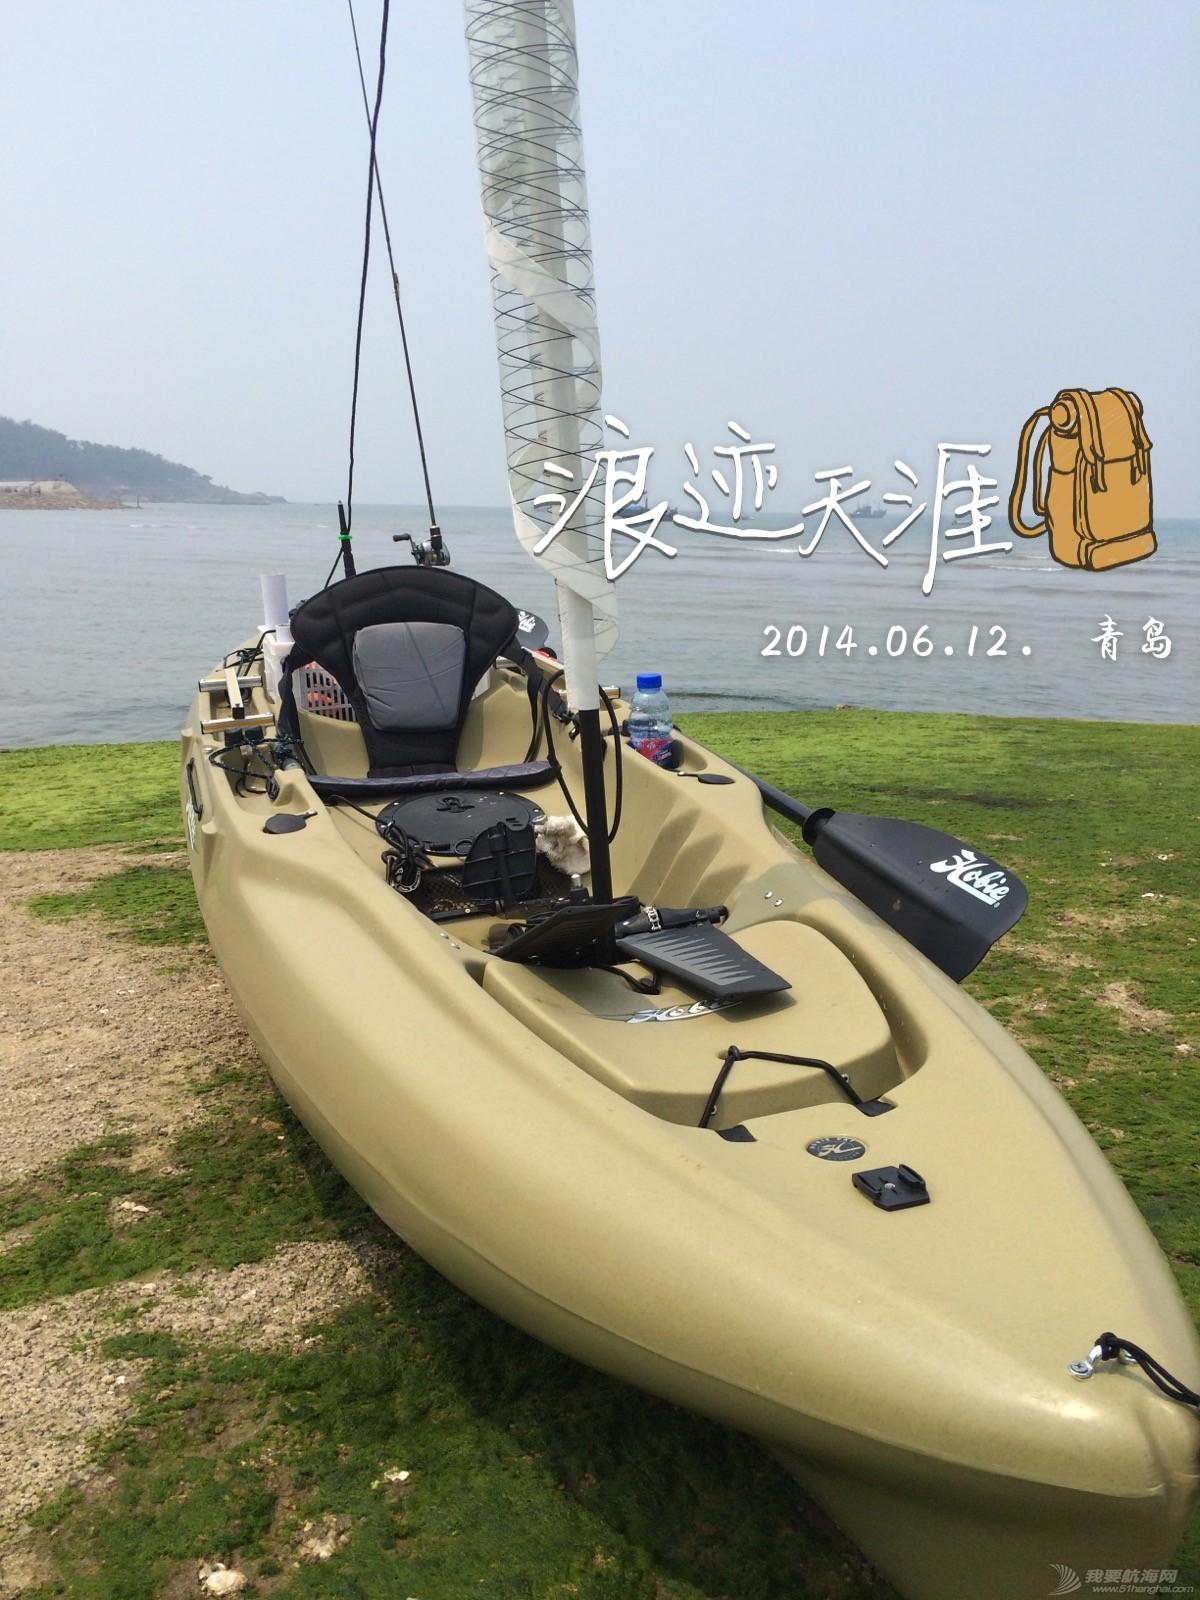 nbsp,原厂,系统,风帆,所以 hobie outback皮划艇 带风帆系统 青岛  002001f272hg238qquq388